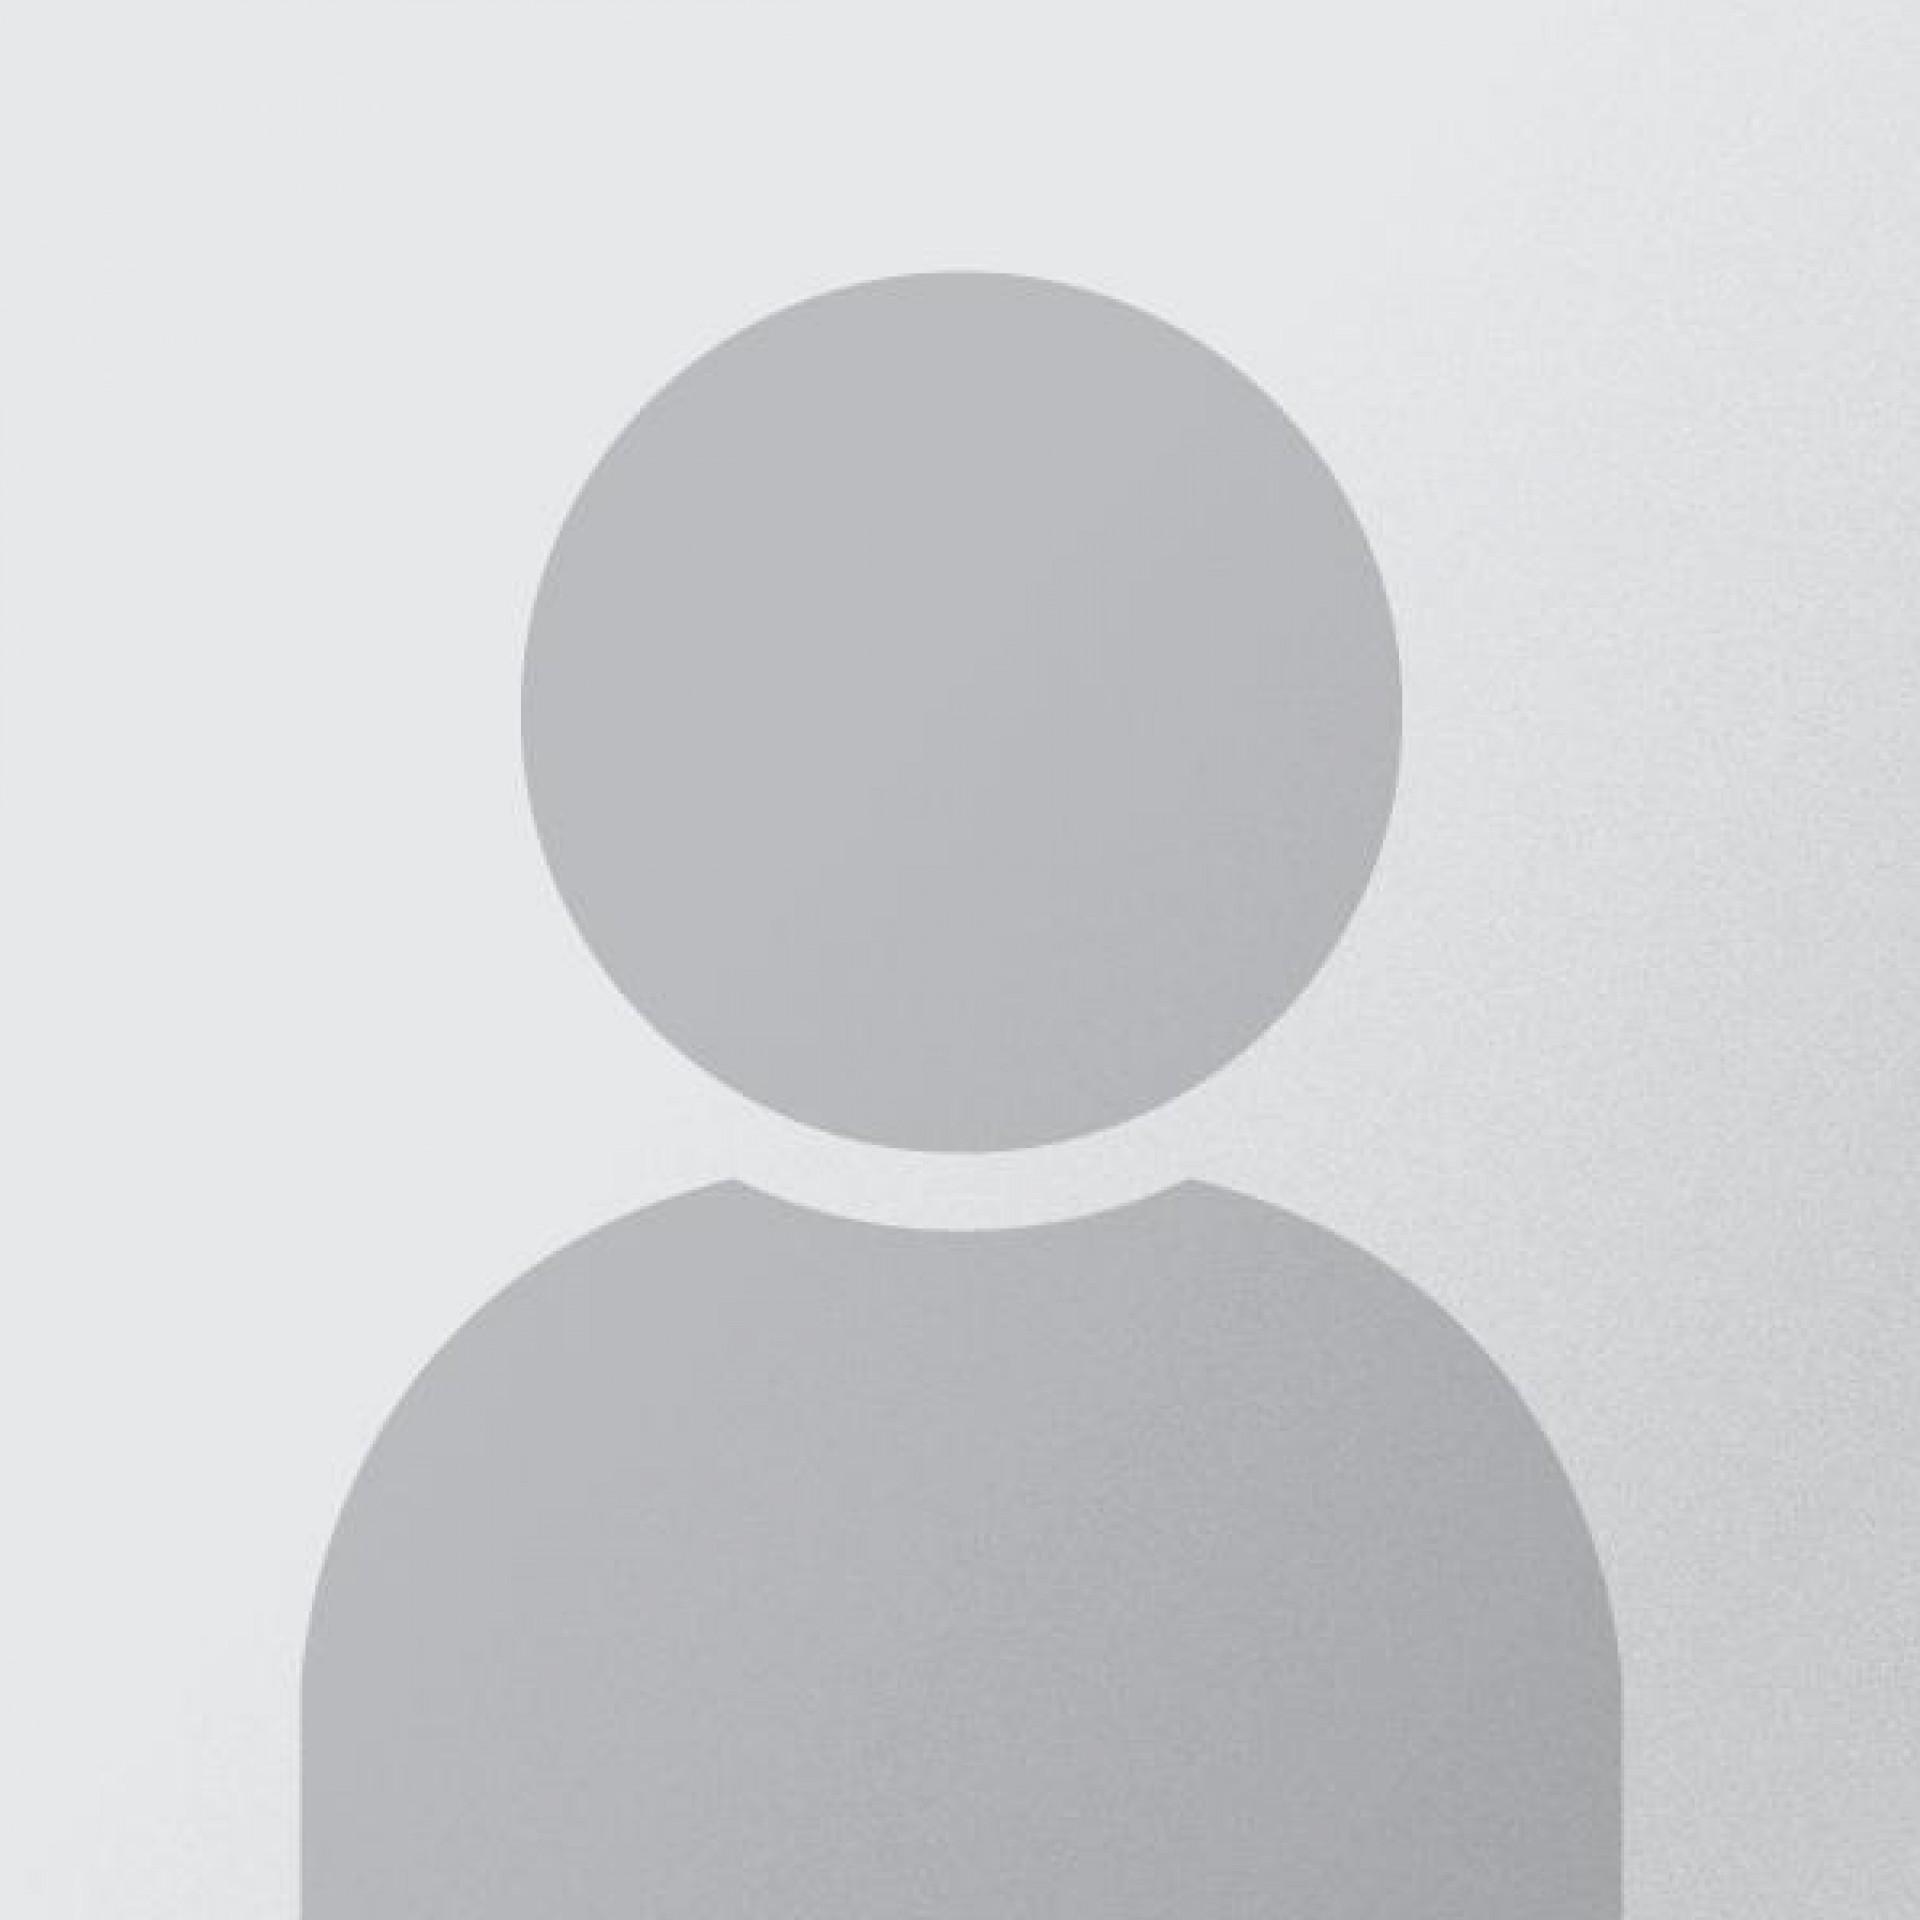 fotografia p021 profilu 0102YH4WRO